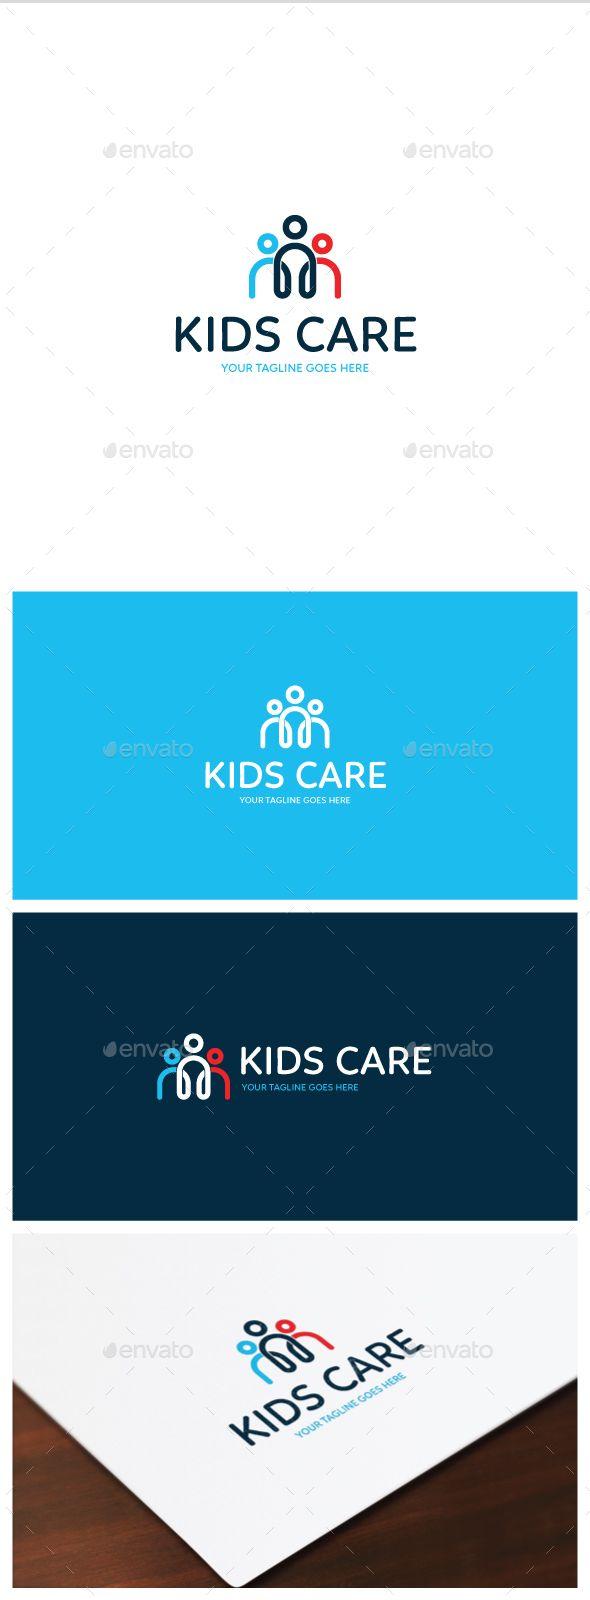 Kids Care Logo Template Vector EPS, AI. Download here: http://graphicriver.net/item/kids-care-logo/14835793?ref=ksioks